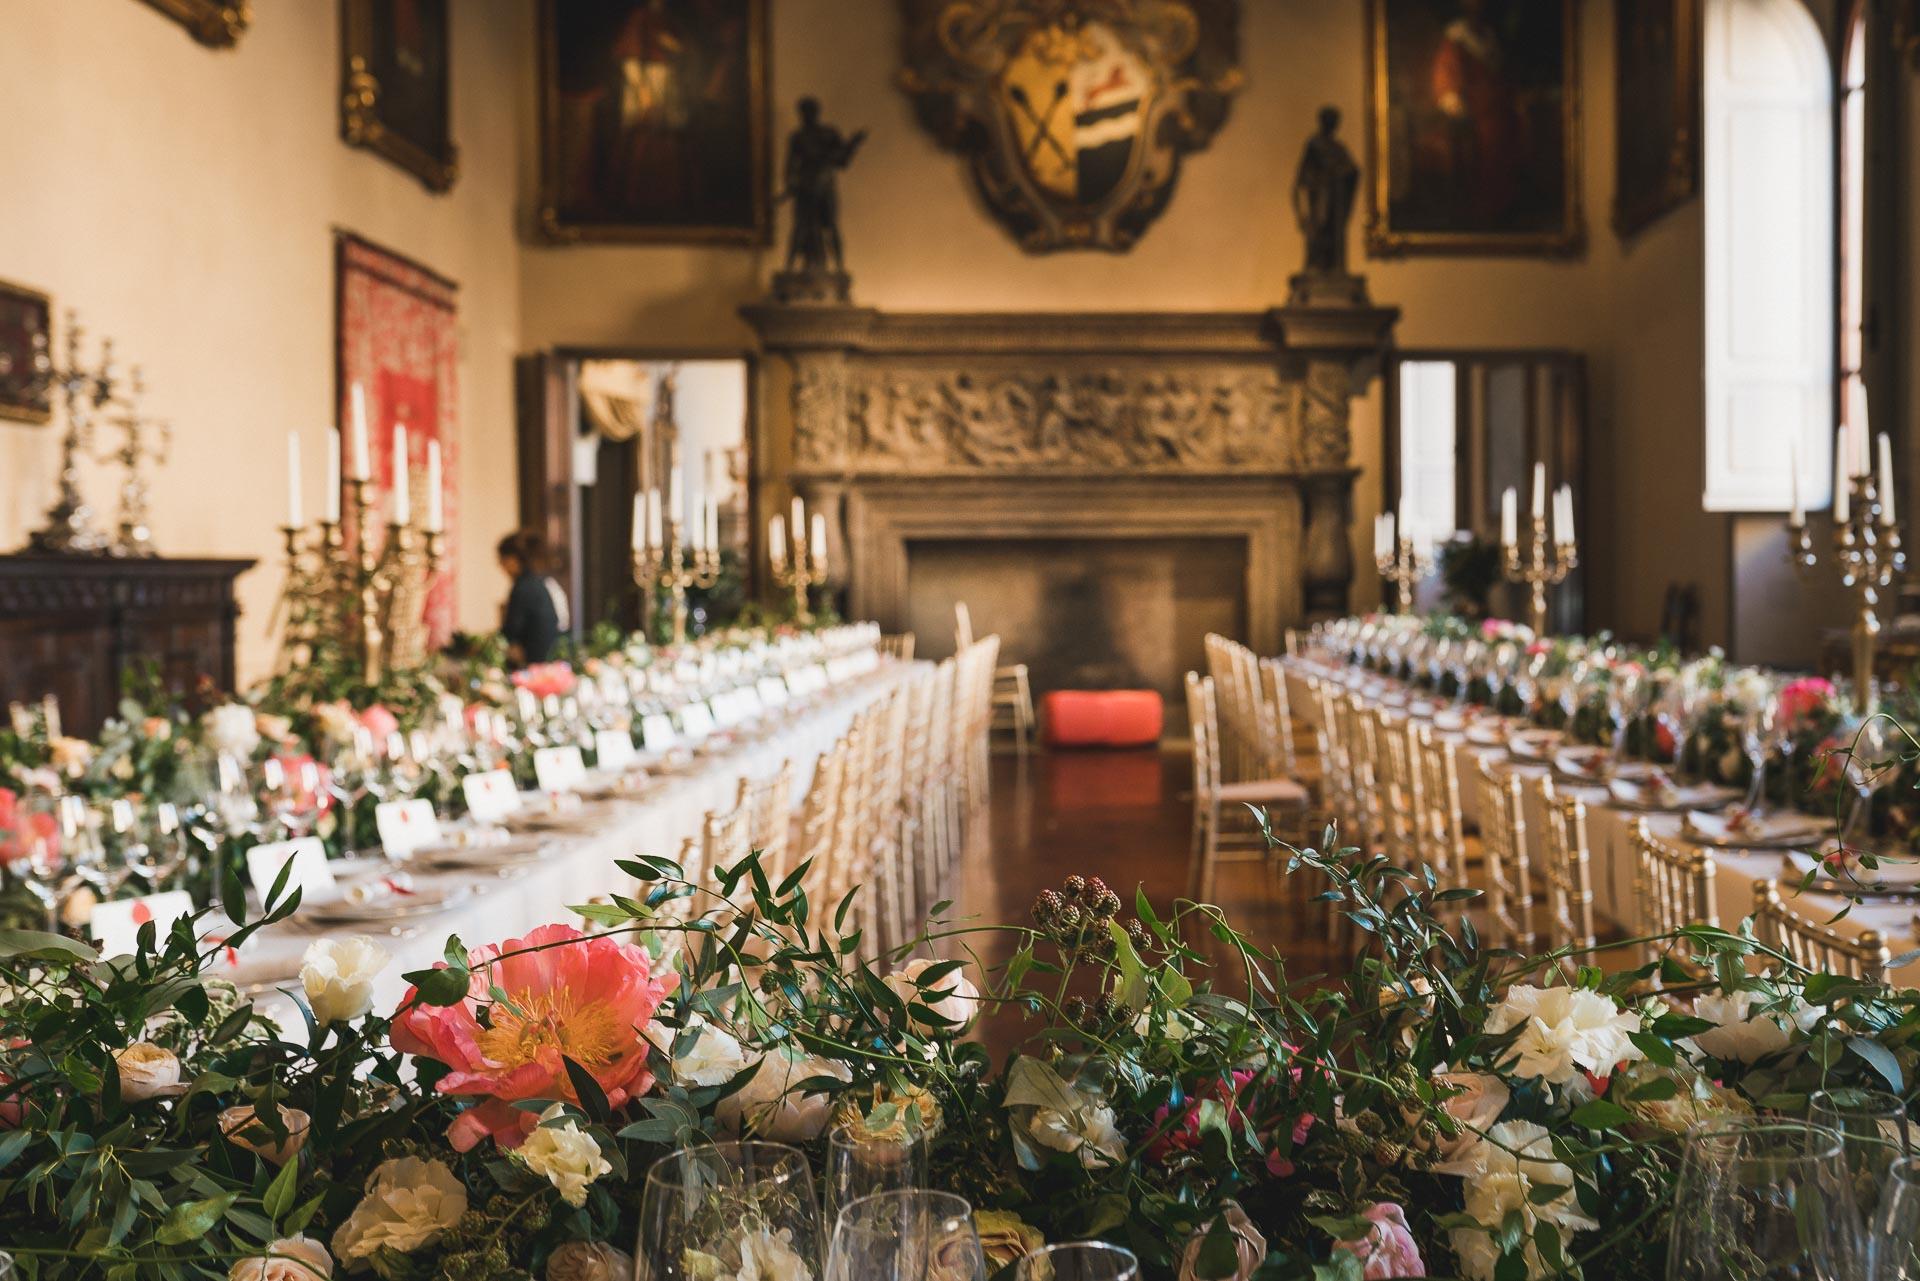 sebastian-flowers-events-photo-stefano-casati palazzo Gondi wedding